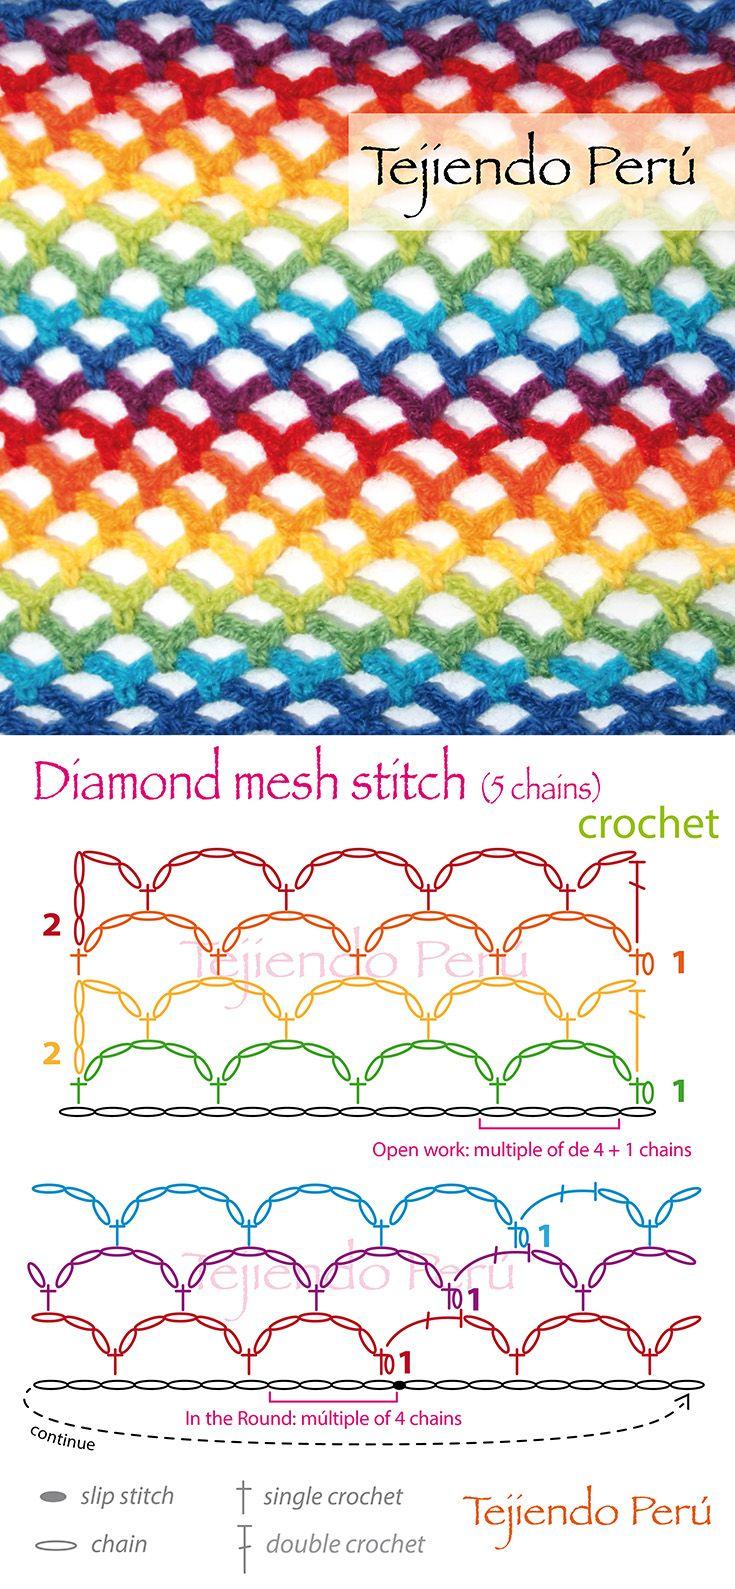 Crochet: diamond mesh stitch (5 chains) diagram (pattern or chart)!